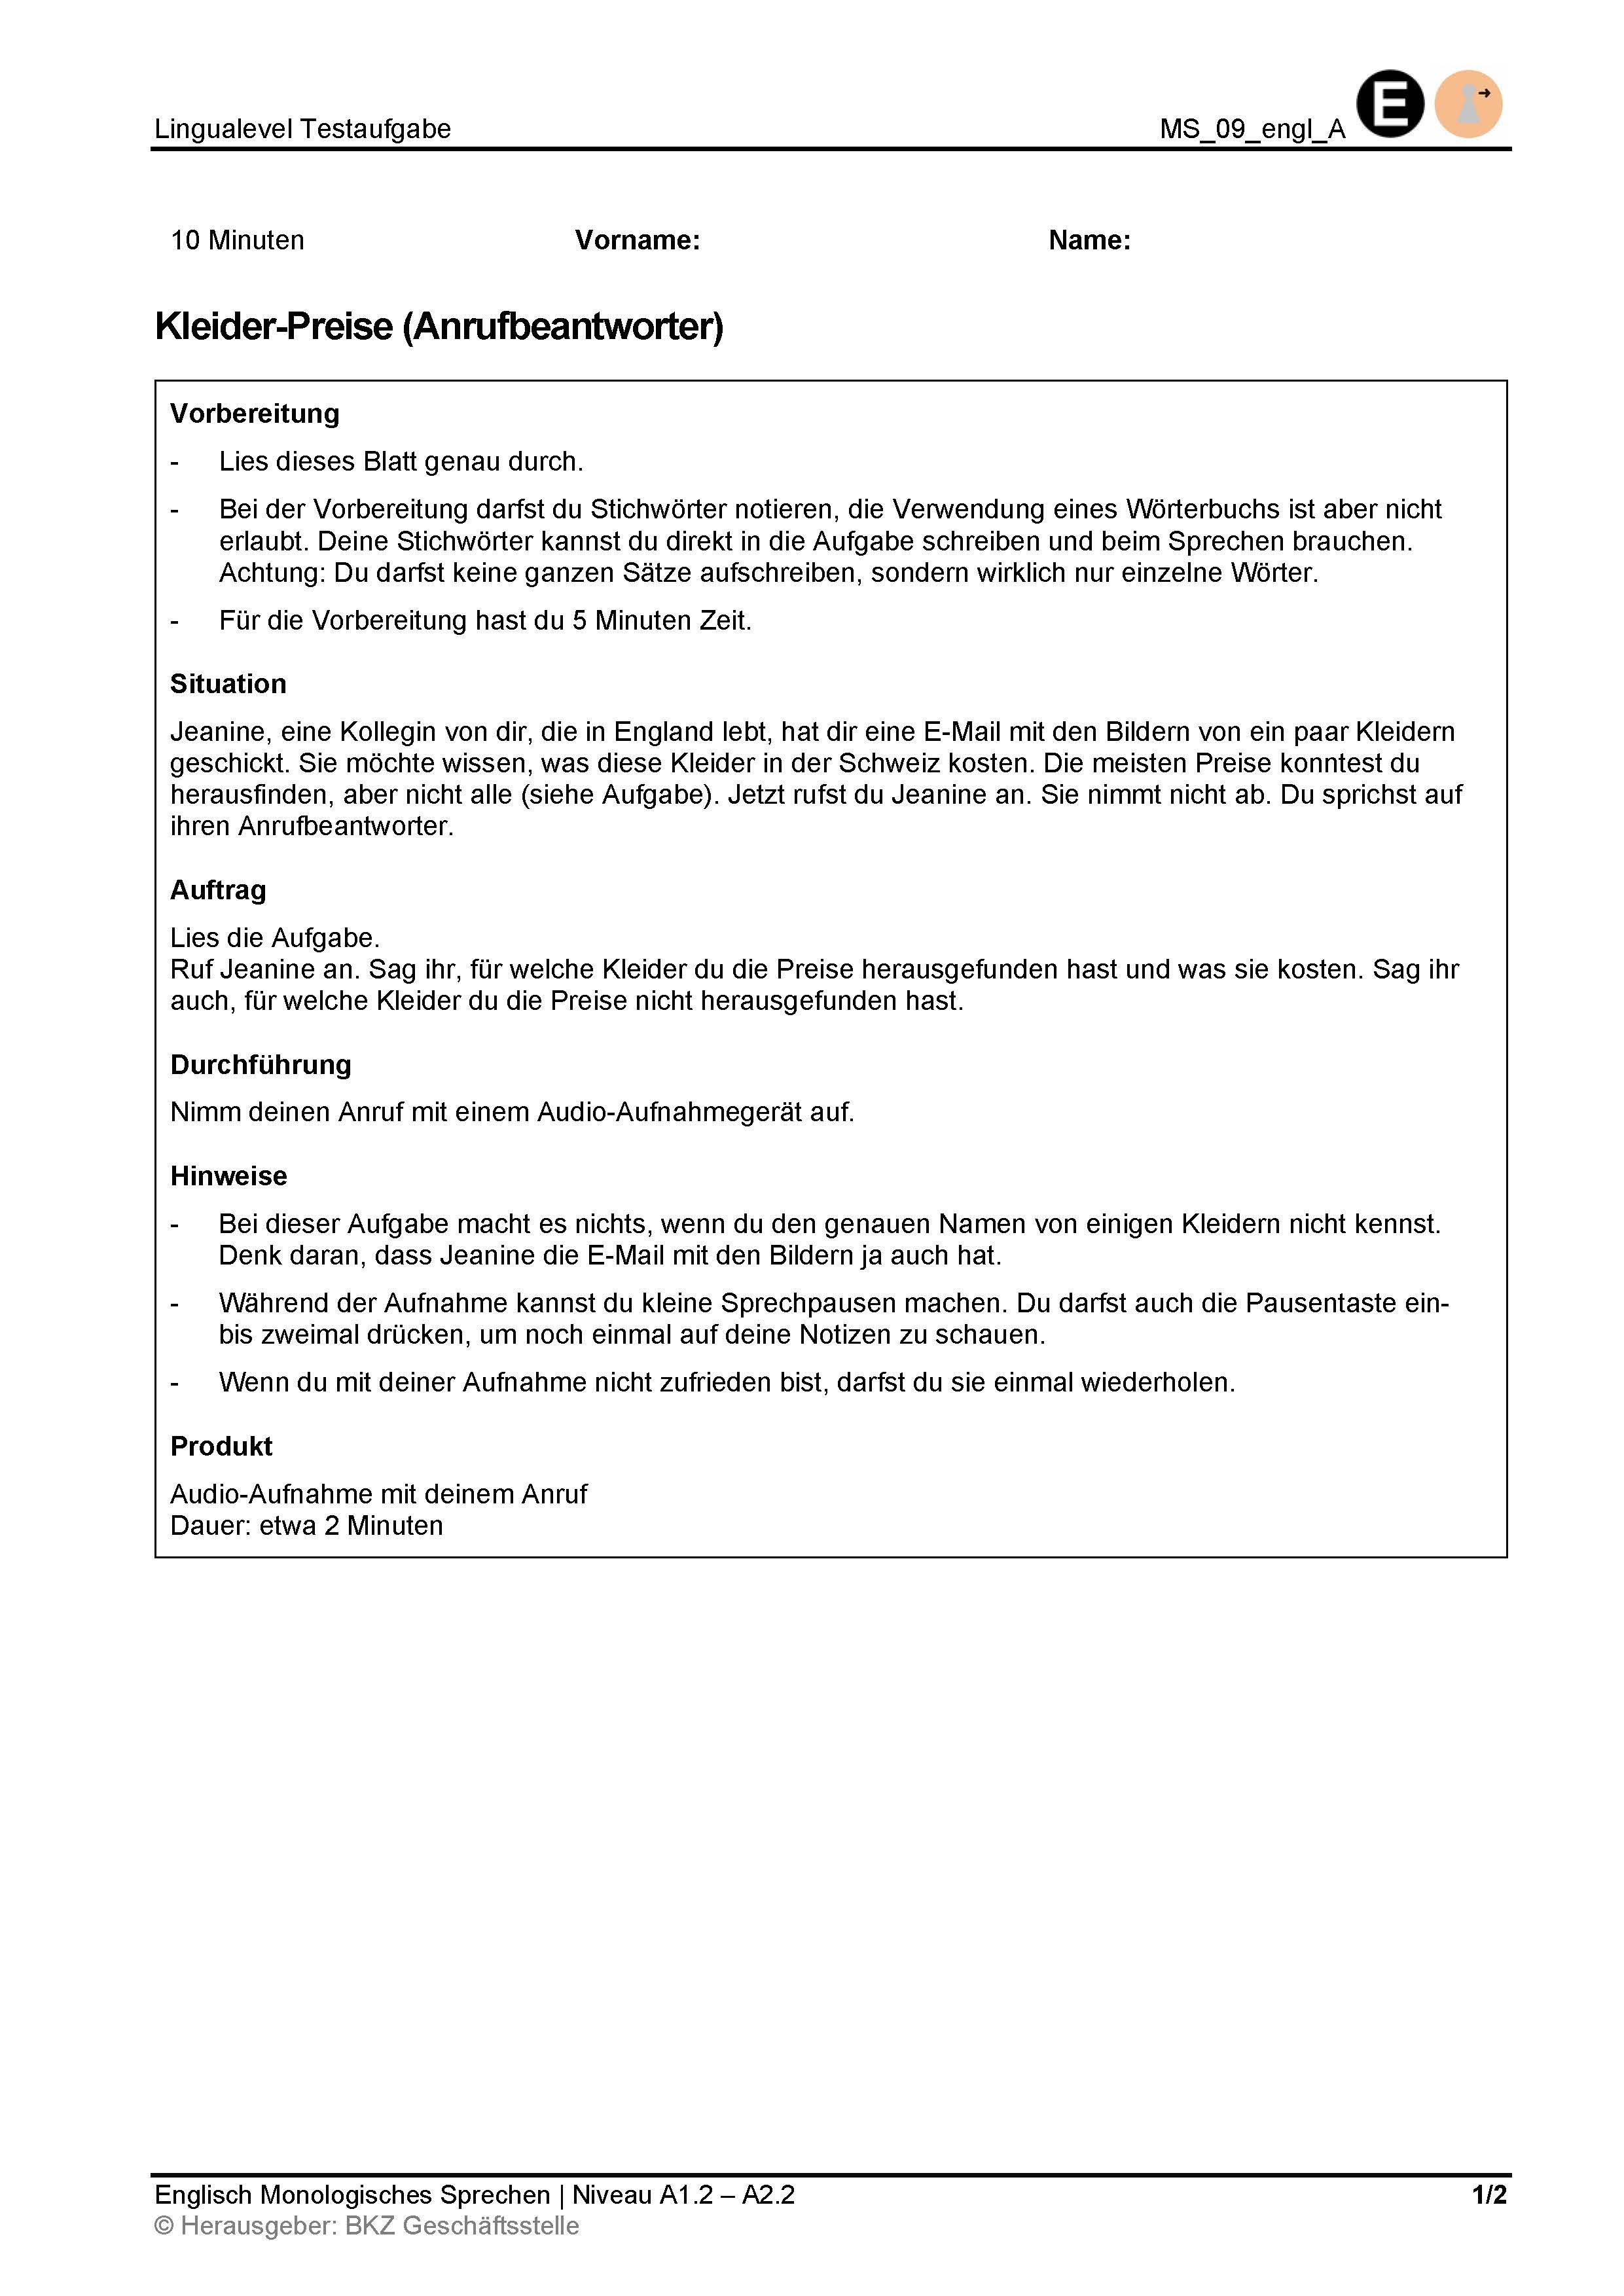 Preview image for LOM object Monologisches Sprechen: Kleider-Preise (Anrufbeantworter)